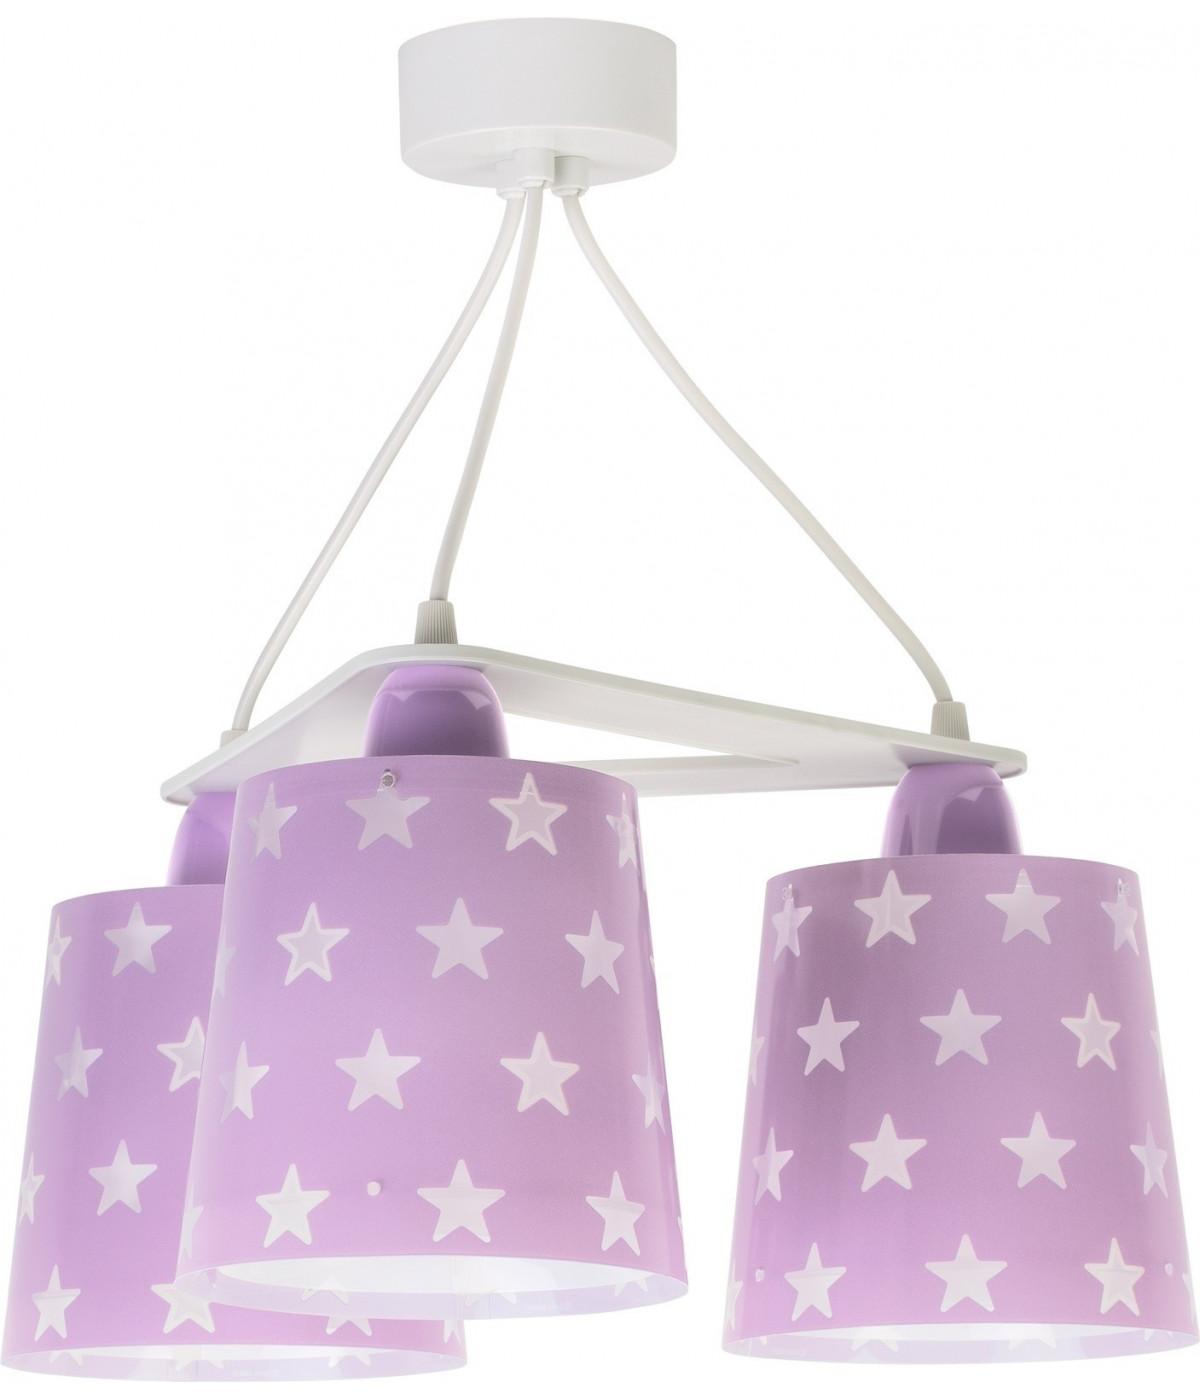 3 light Kids Hanging lamp Stars purple